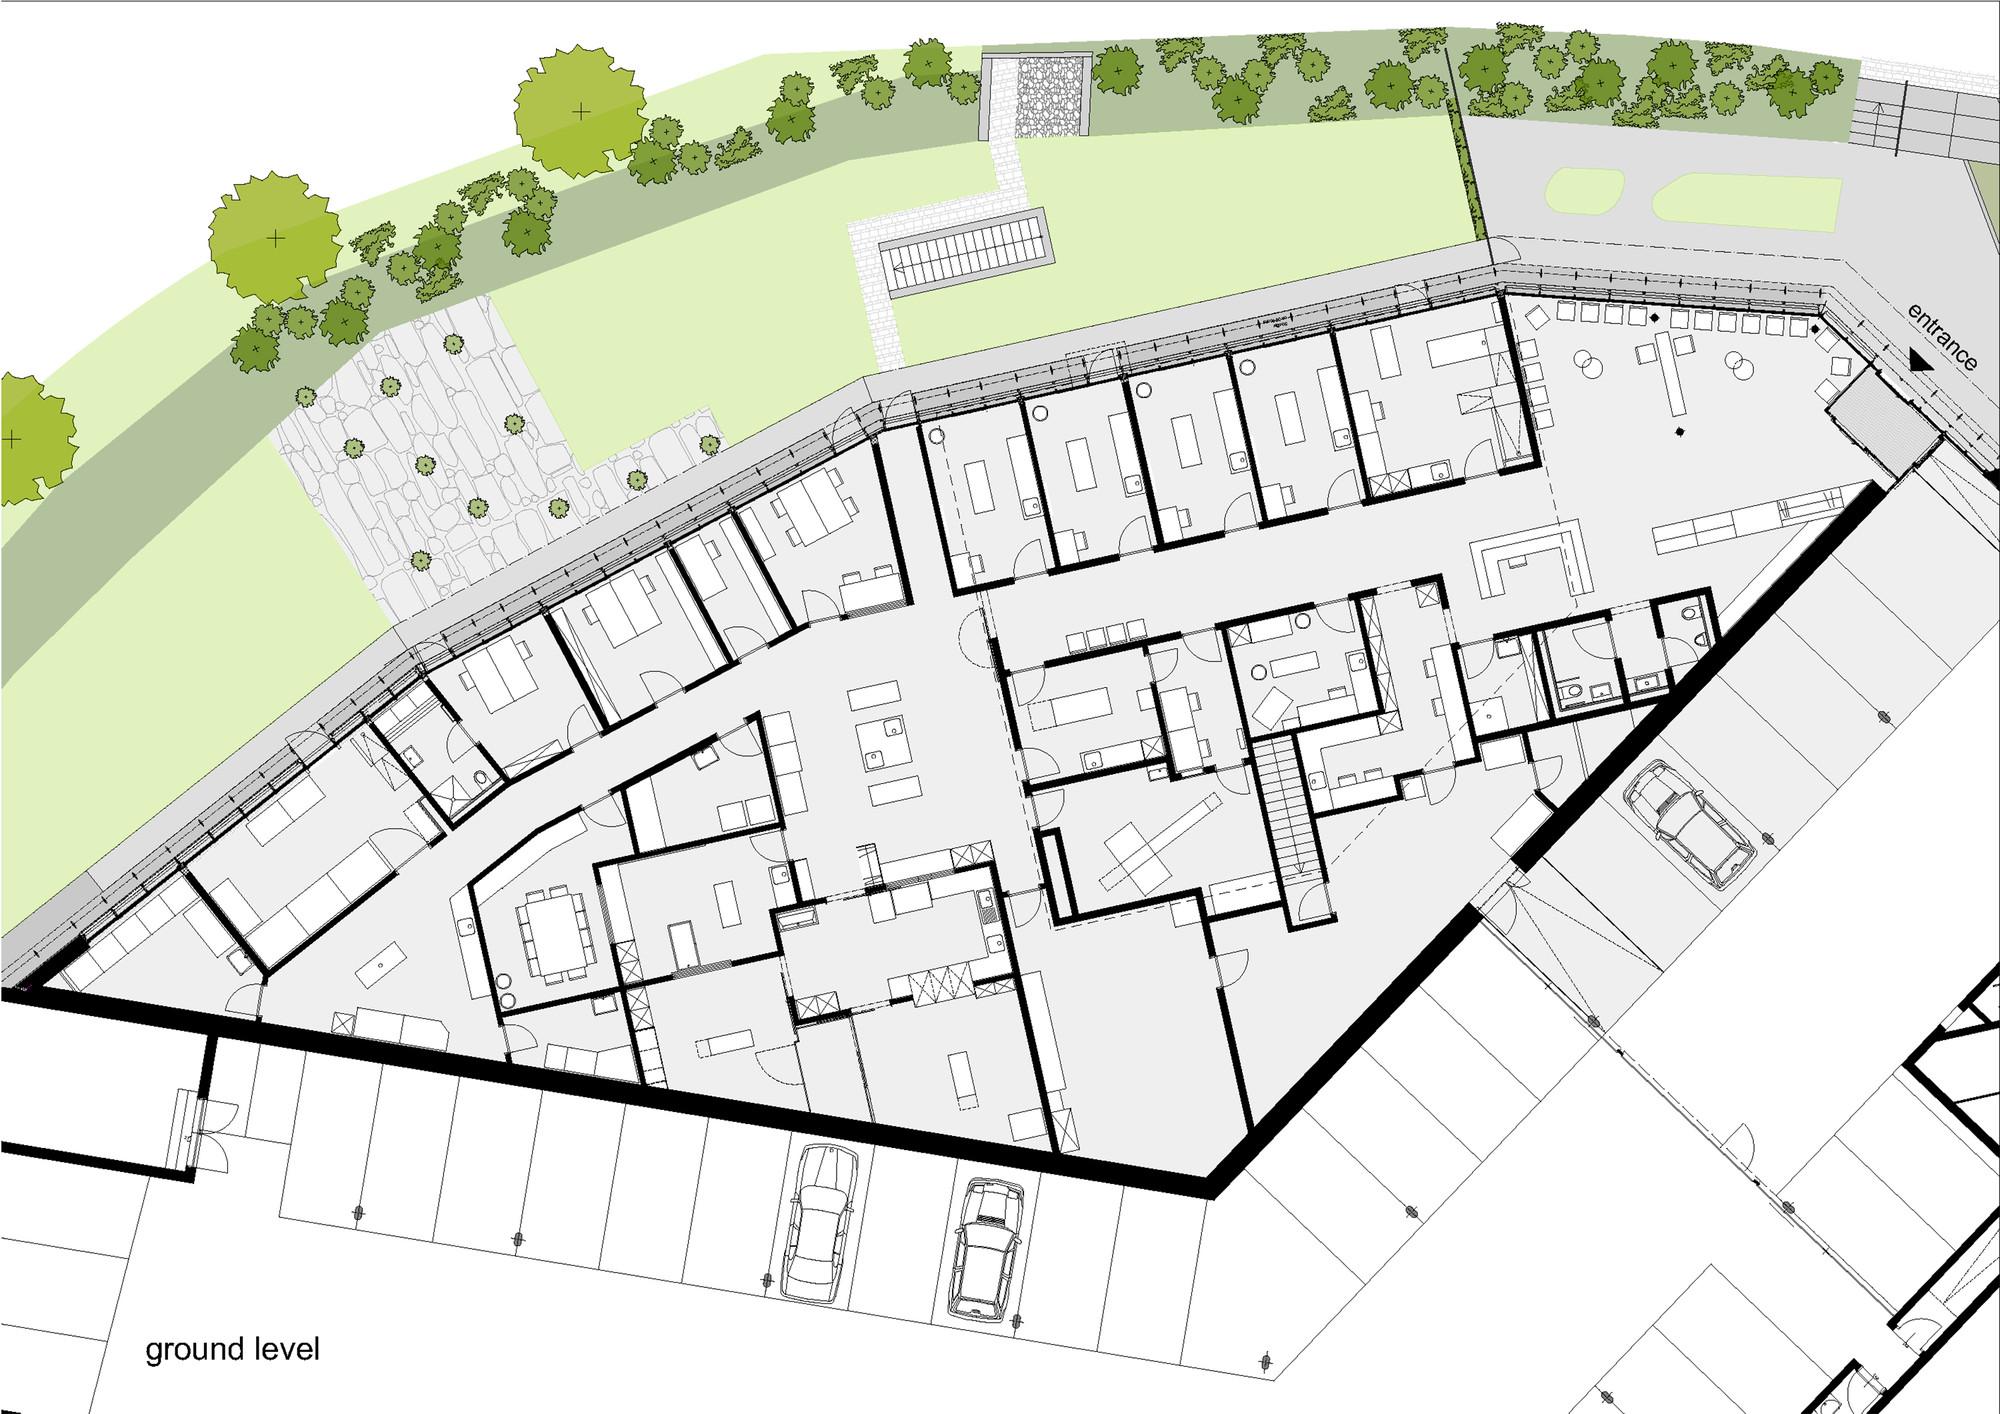 5500f122e58ece8129000135 Ground Floor Plan on Veterinary Clinic Floor Plans